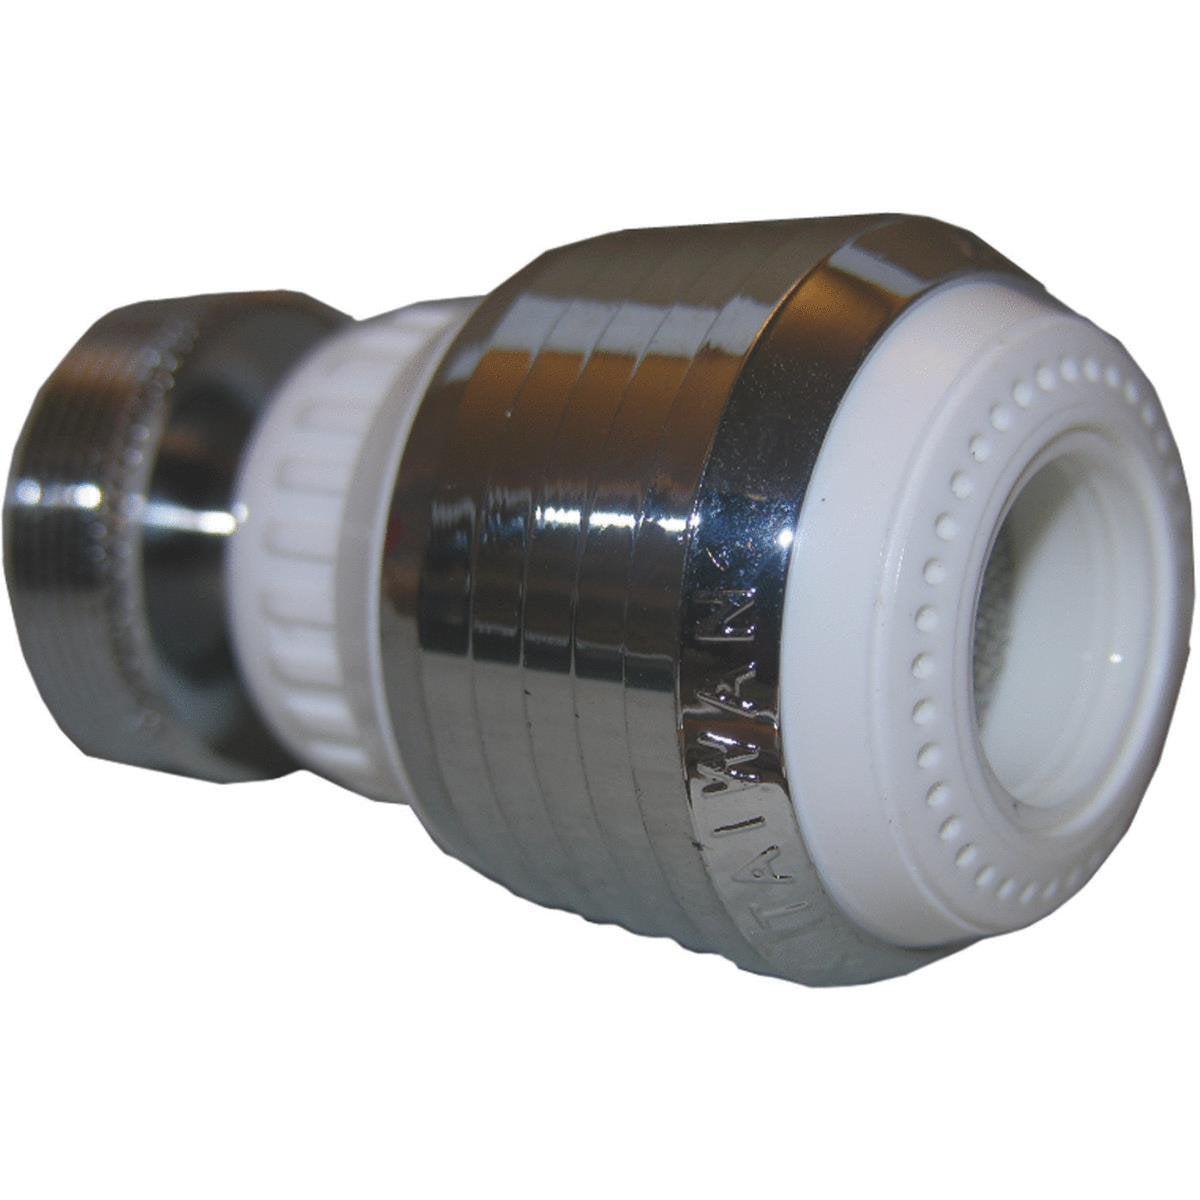 Lasco Swivel Spray Dual Thread Dual Pattern Faucet Aerator